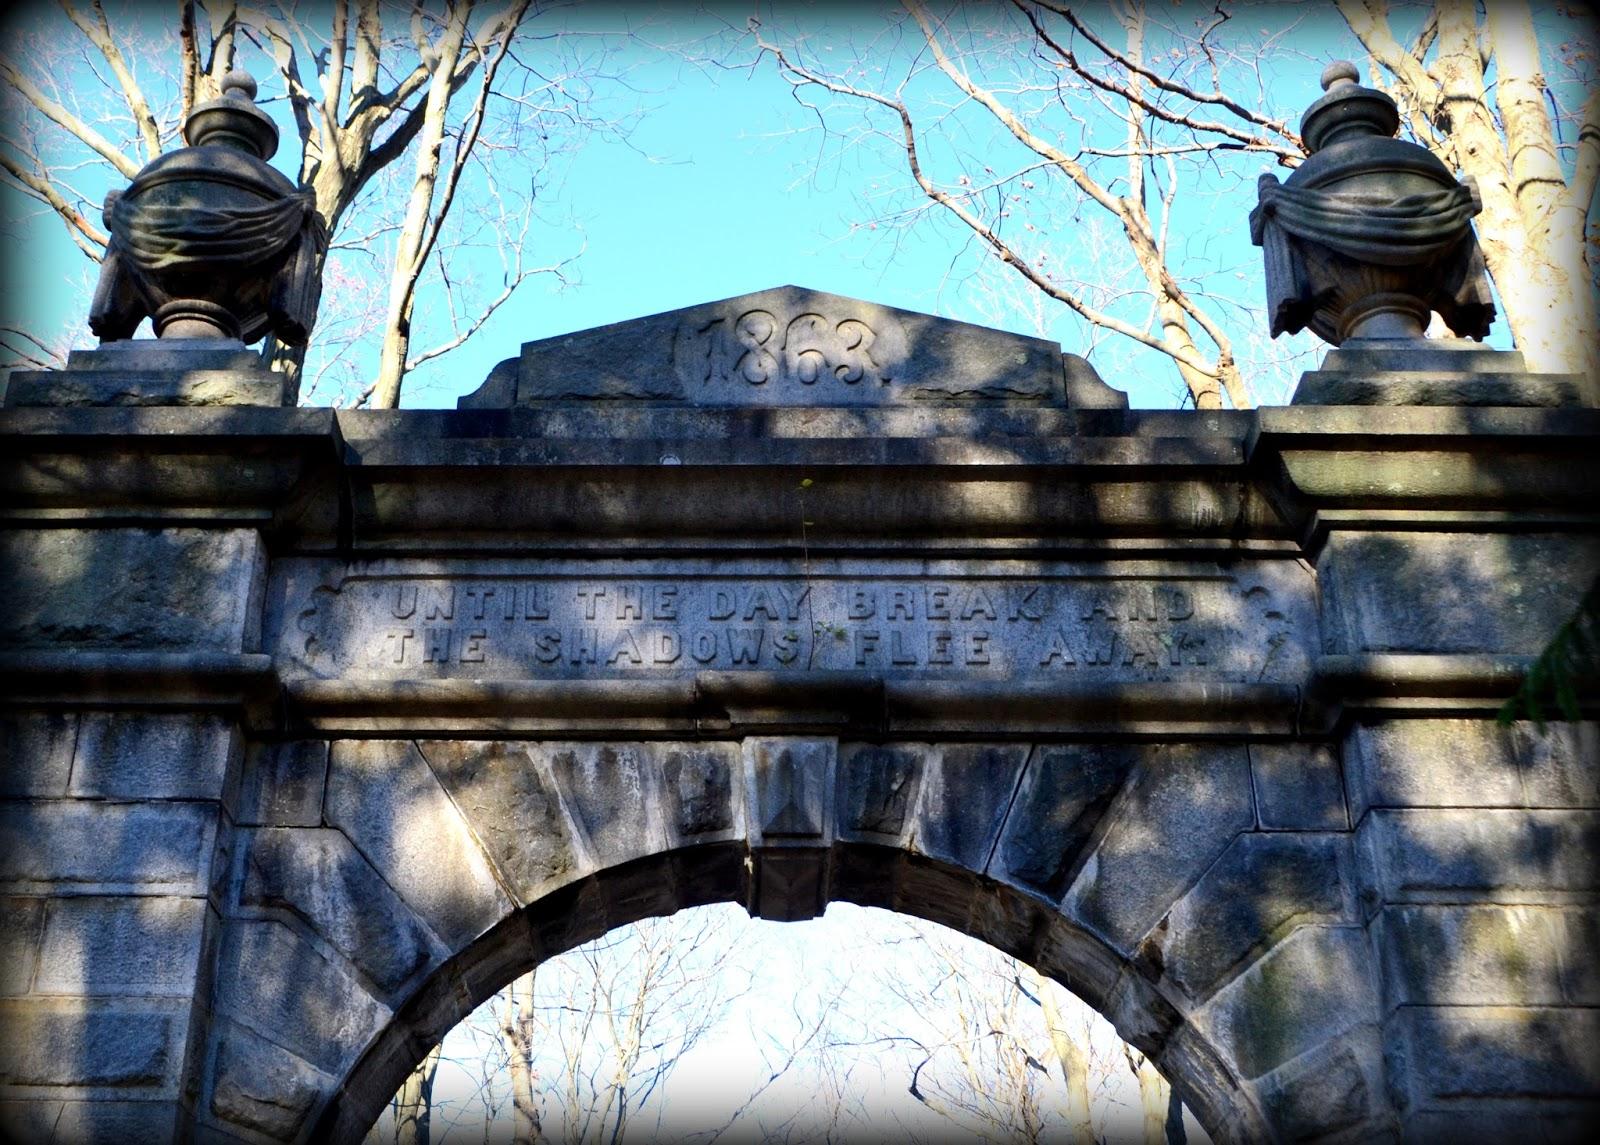 gate, granite, stone, shadows, cemetery, newburyport